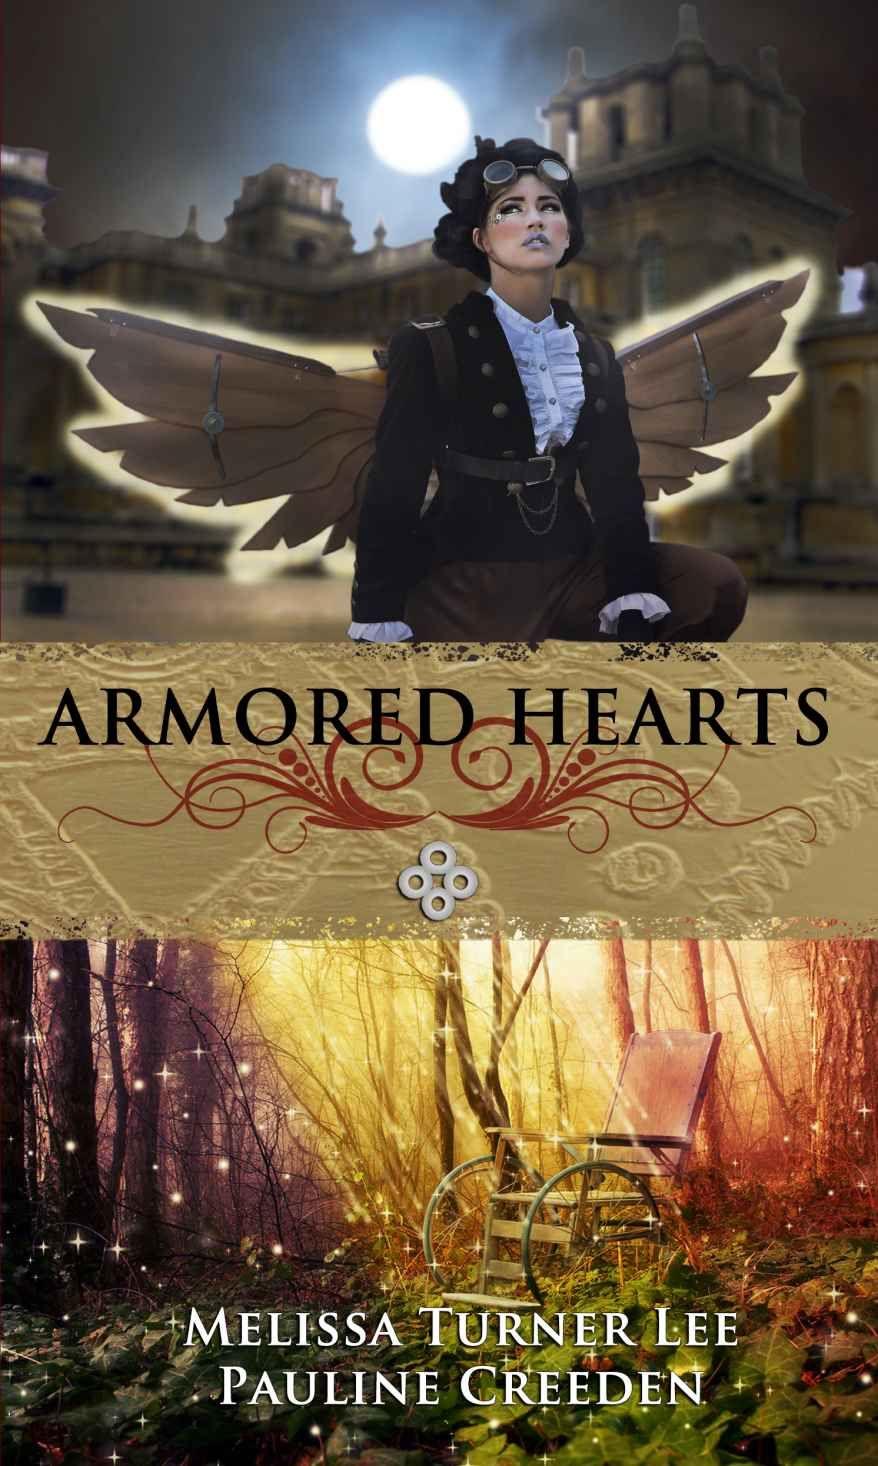 Amazon.com: Armored Hearts (Fantasy Steampunk) eBook: Melissa Turner Lee, Pauline Creeden: Kindle Store